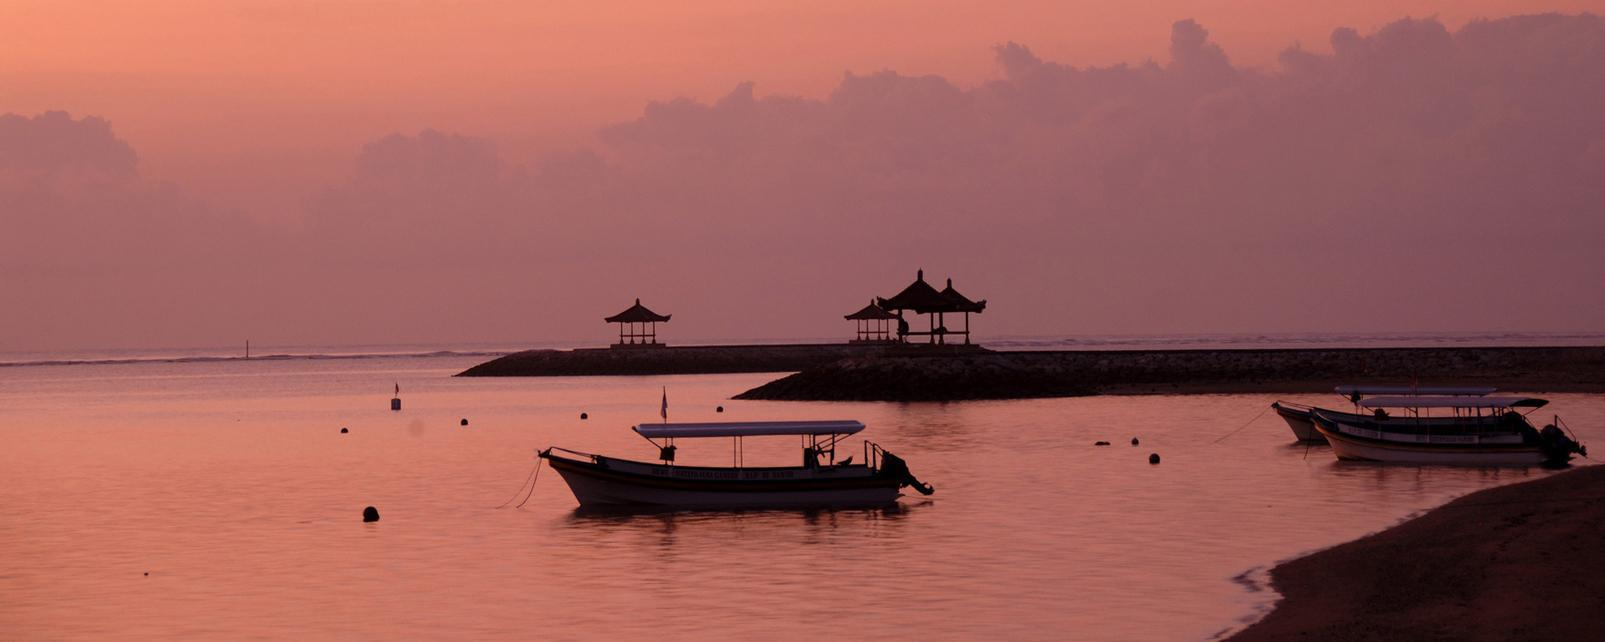 Asie; Indonésie; Bali; Nusa Dua;